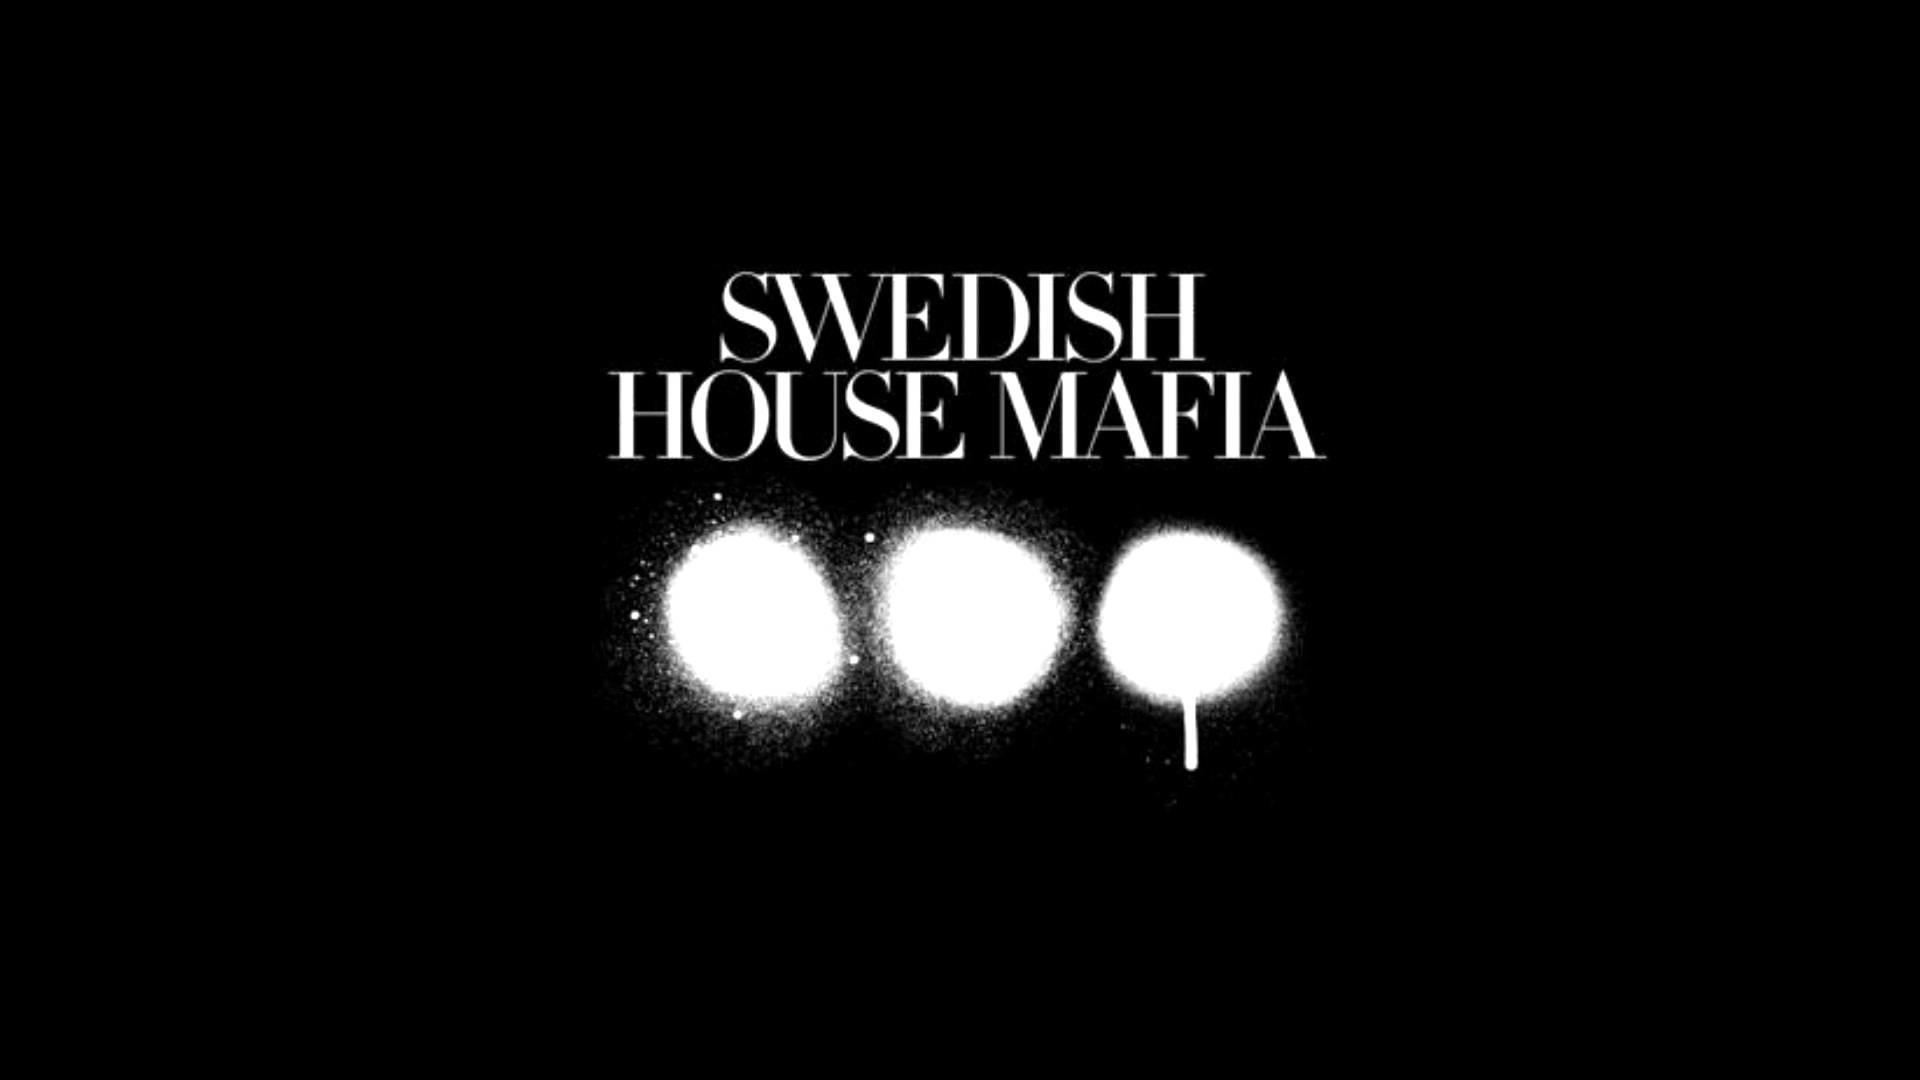 Swedish House Mafia 03 | hdwallpapers-